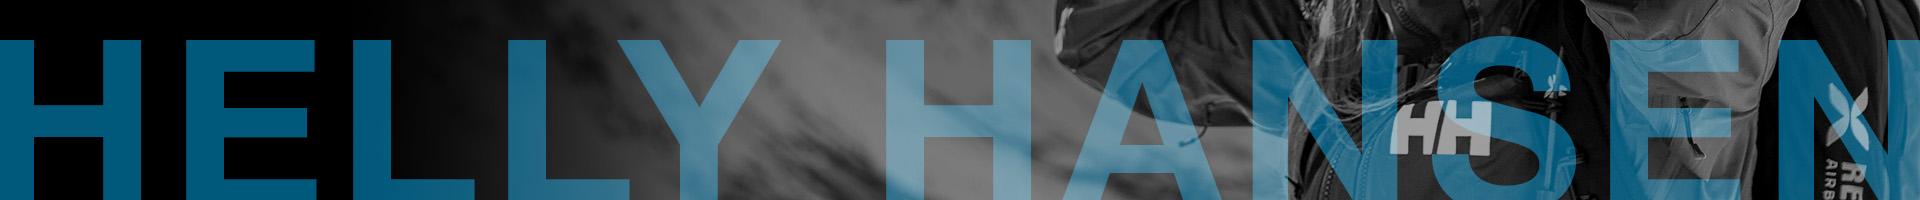 HELLY HANSEN - MEN'S & WOMEN'S PERFORMANCE OUTERWEAR